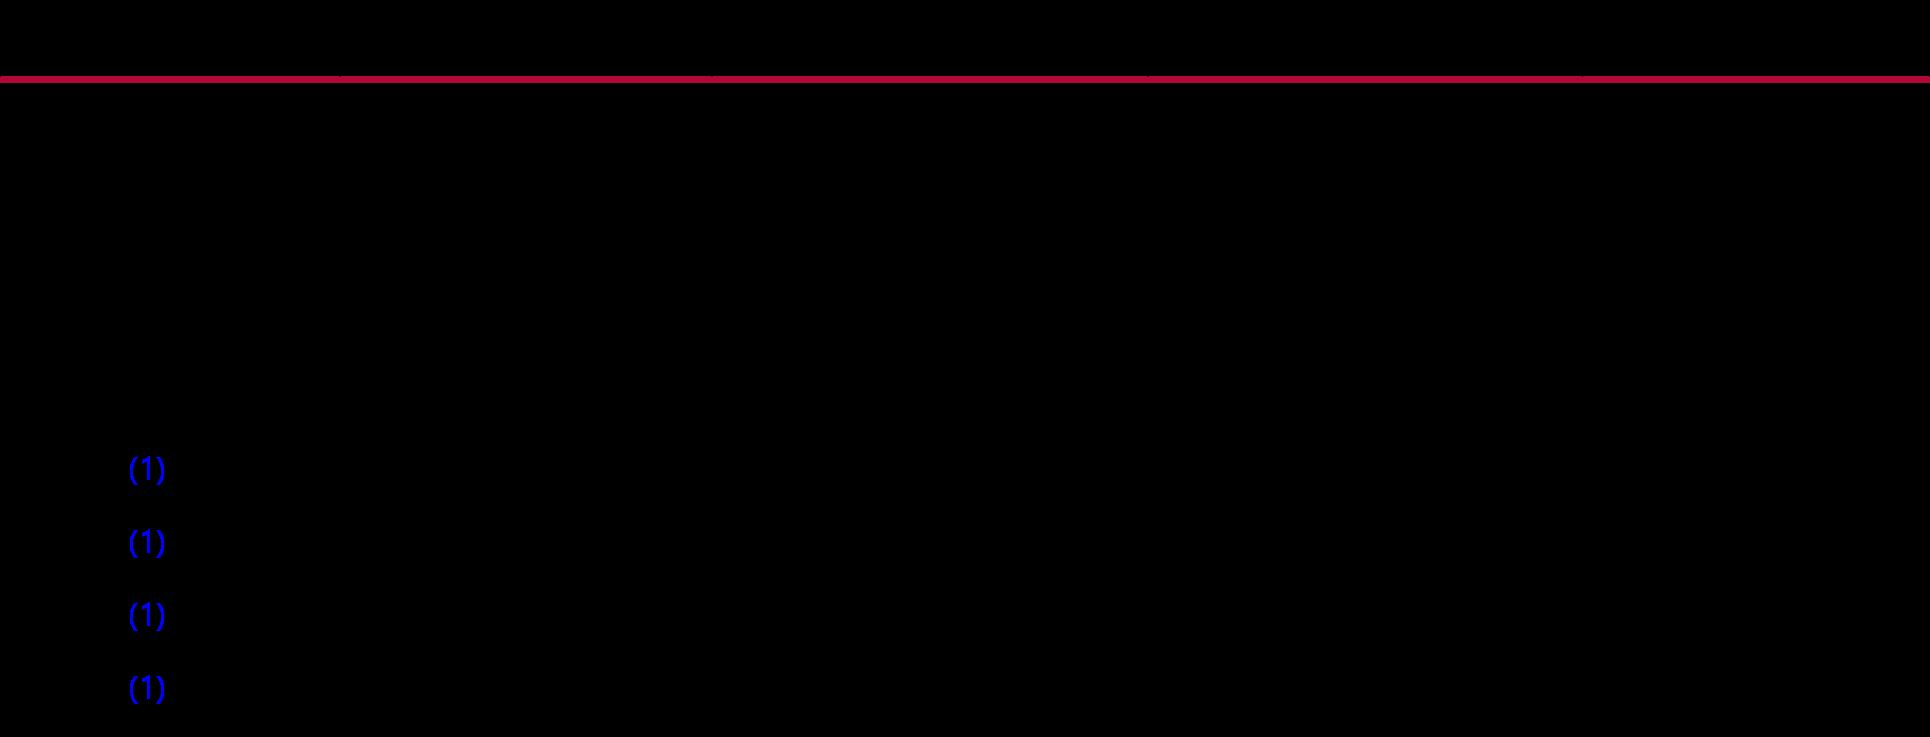 GTR-interconnect-matrix.png